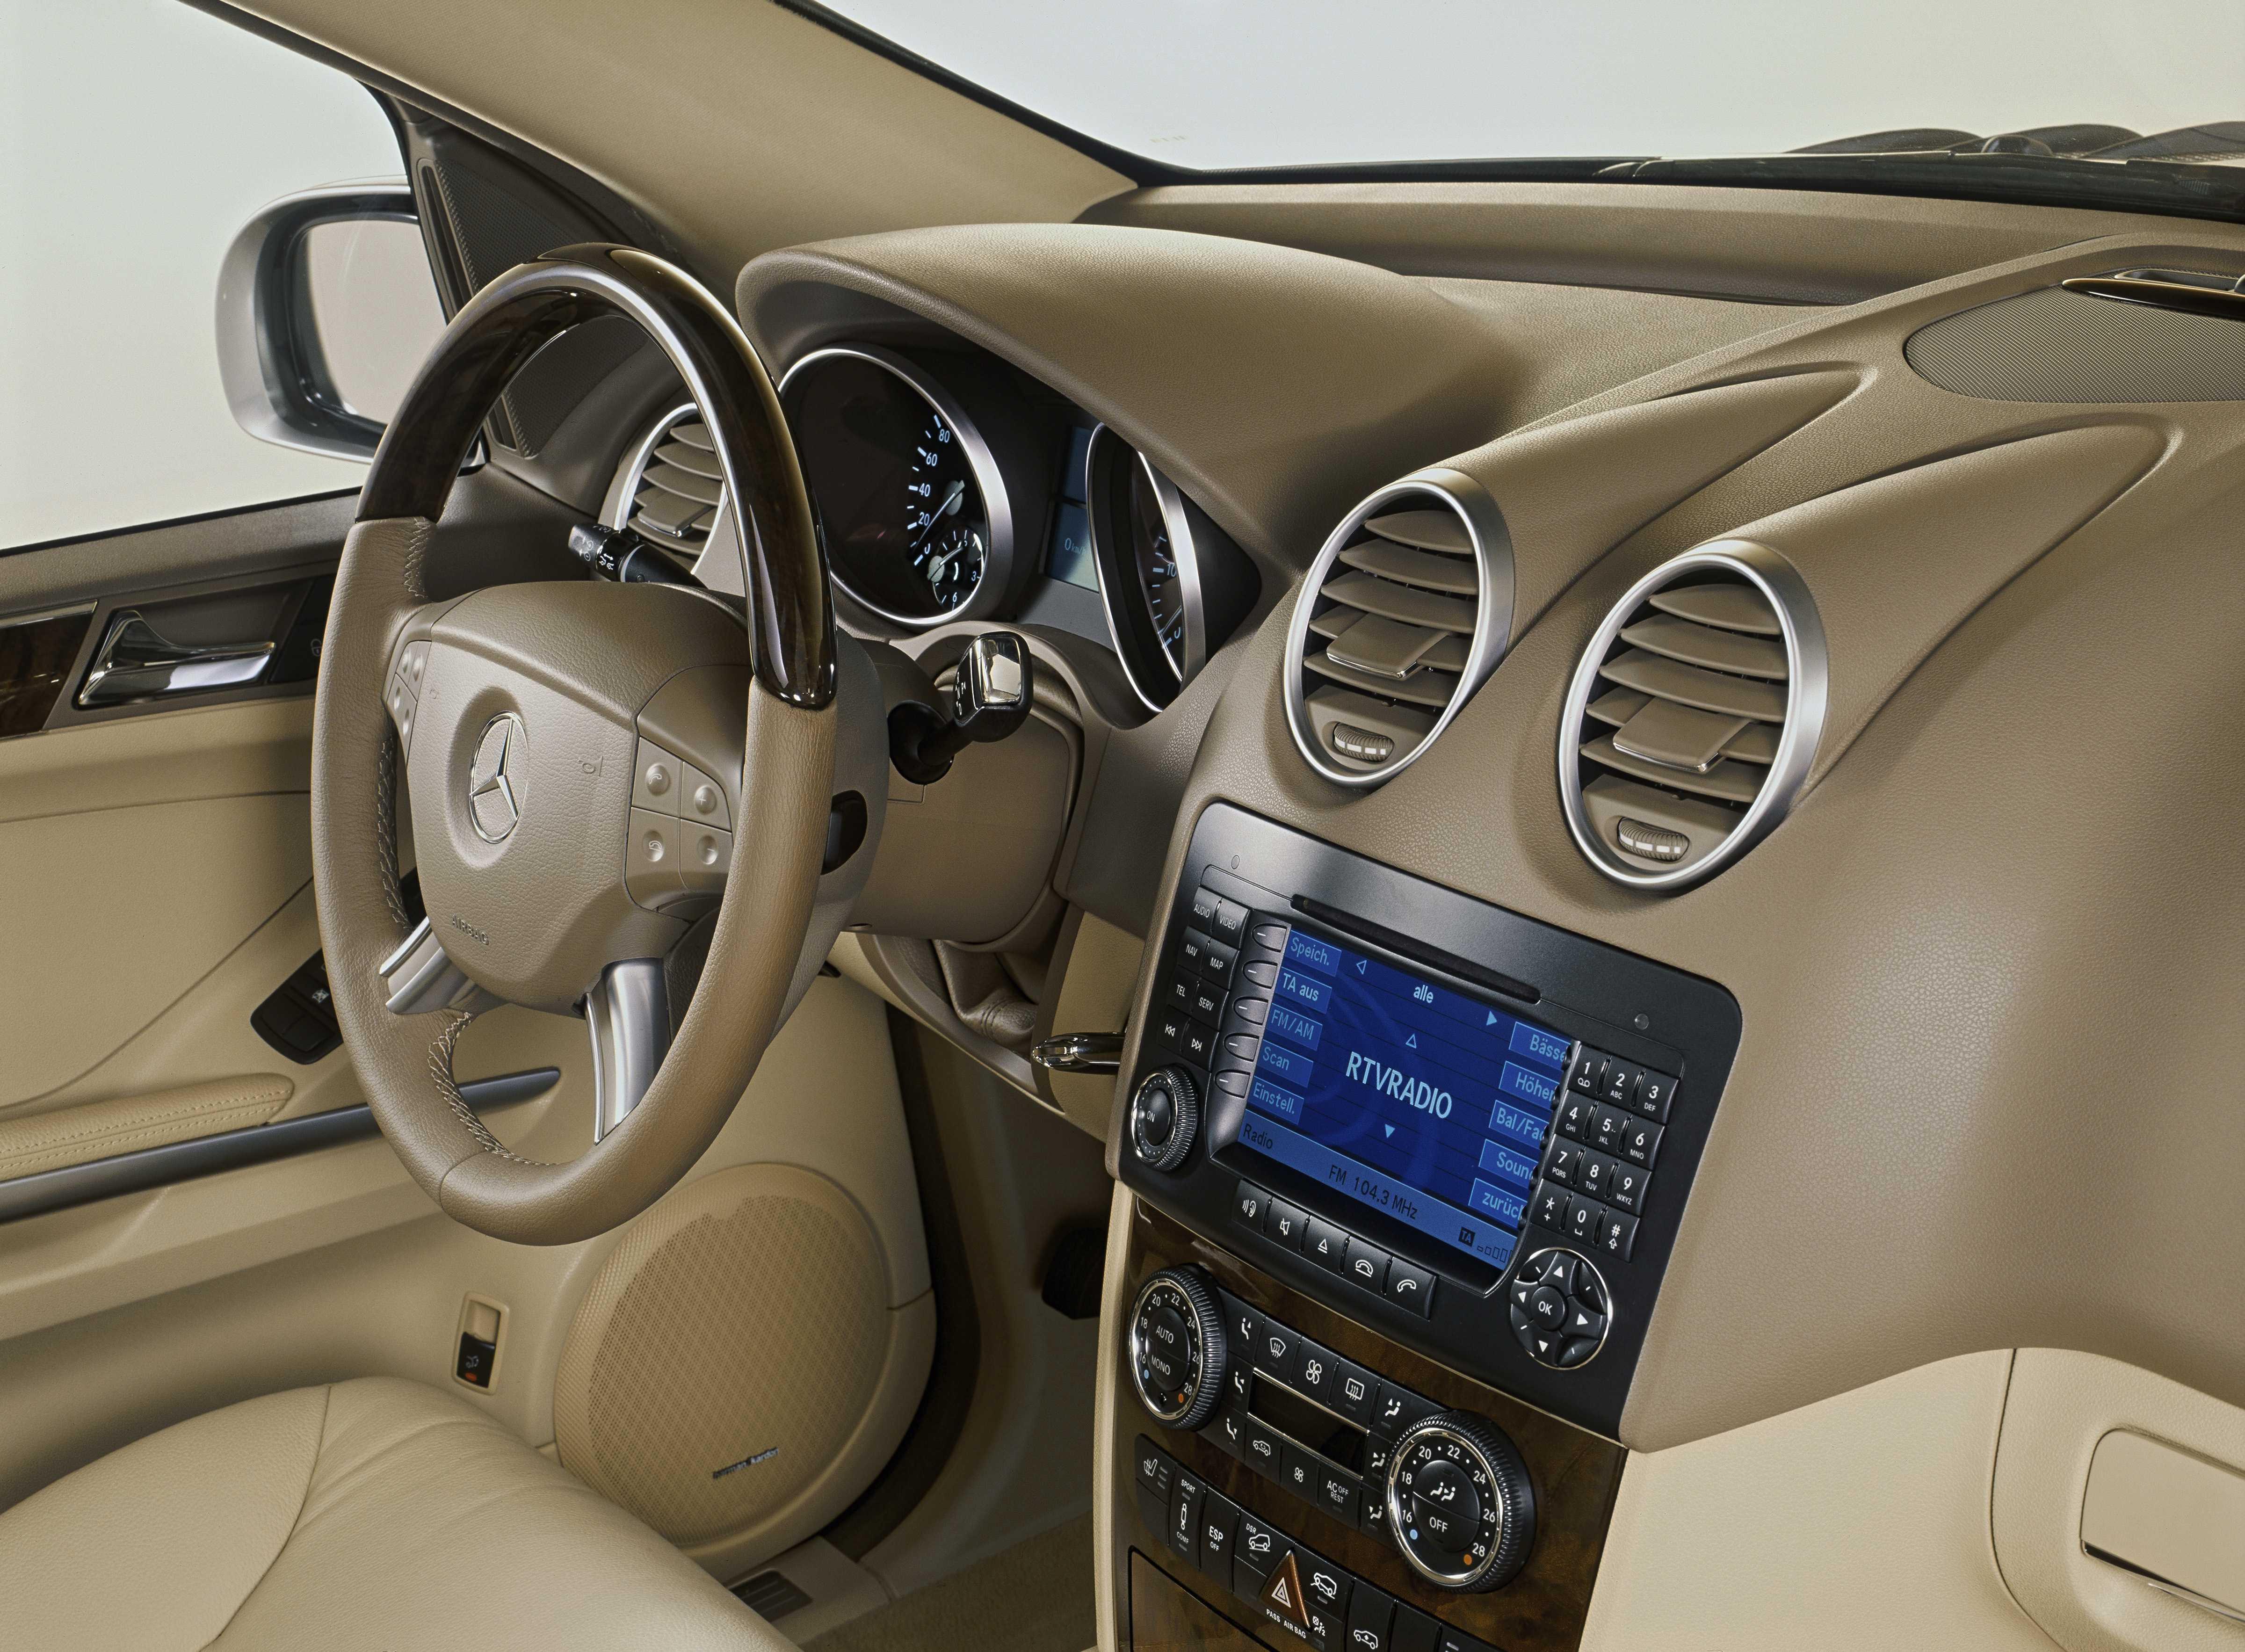 Mercedes Benz M Class Interior